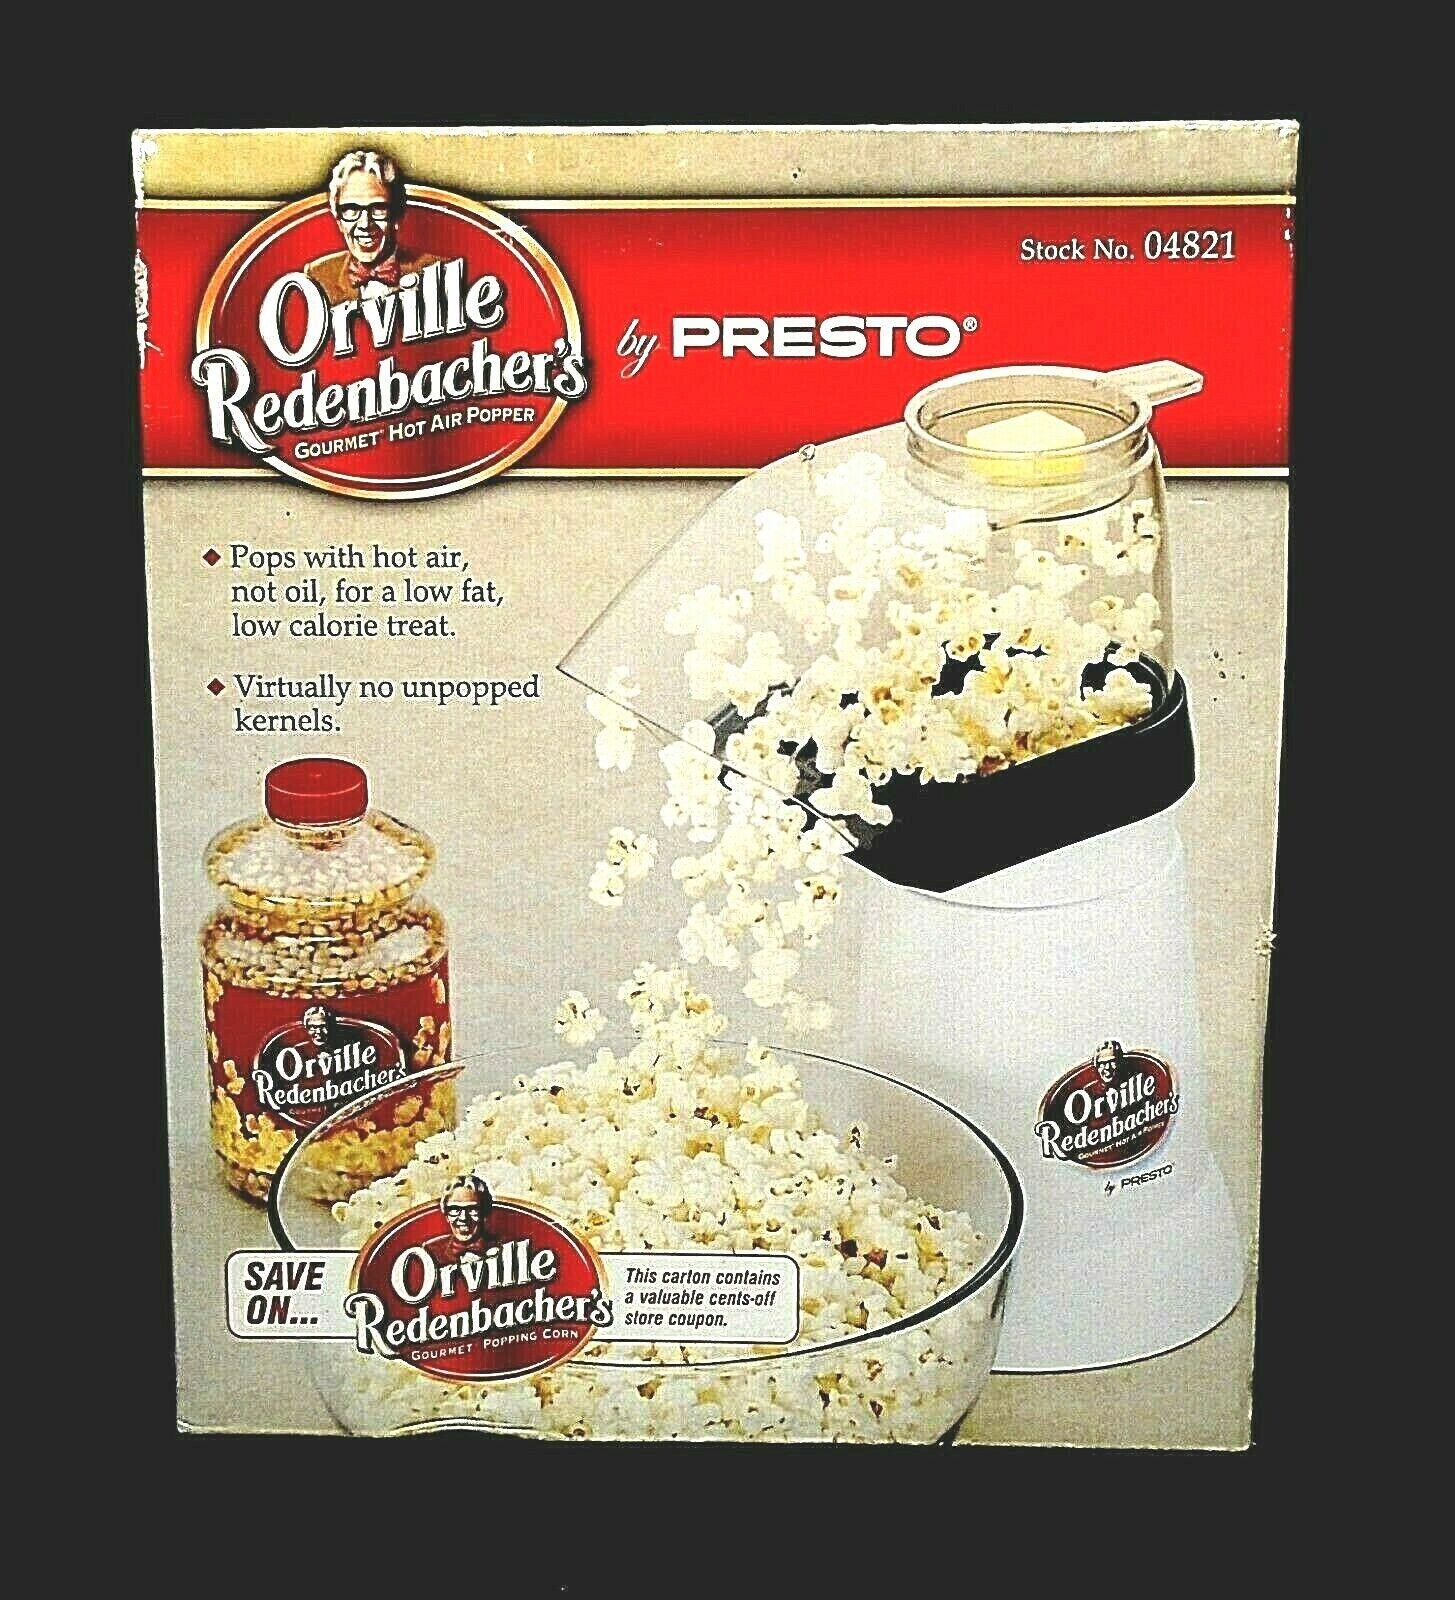 Presto 04821 Orville Redenbachers Hot Air Popper 2-PACK